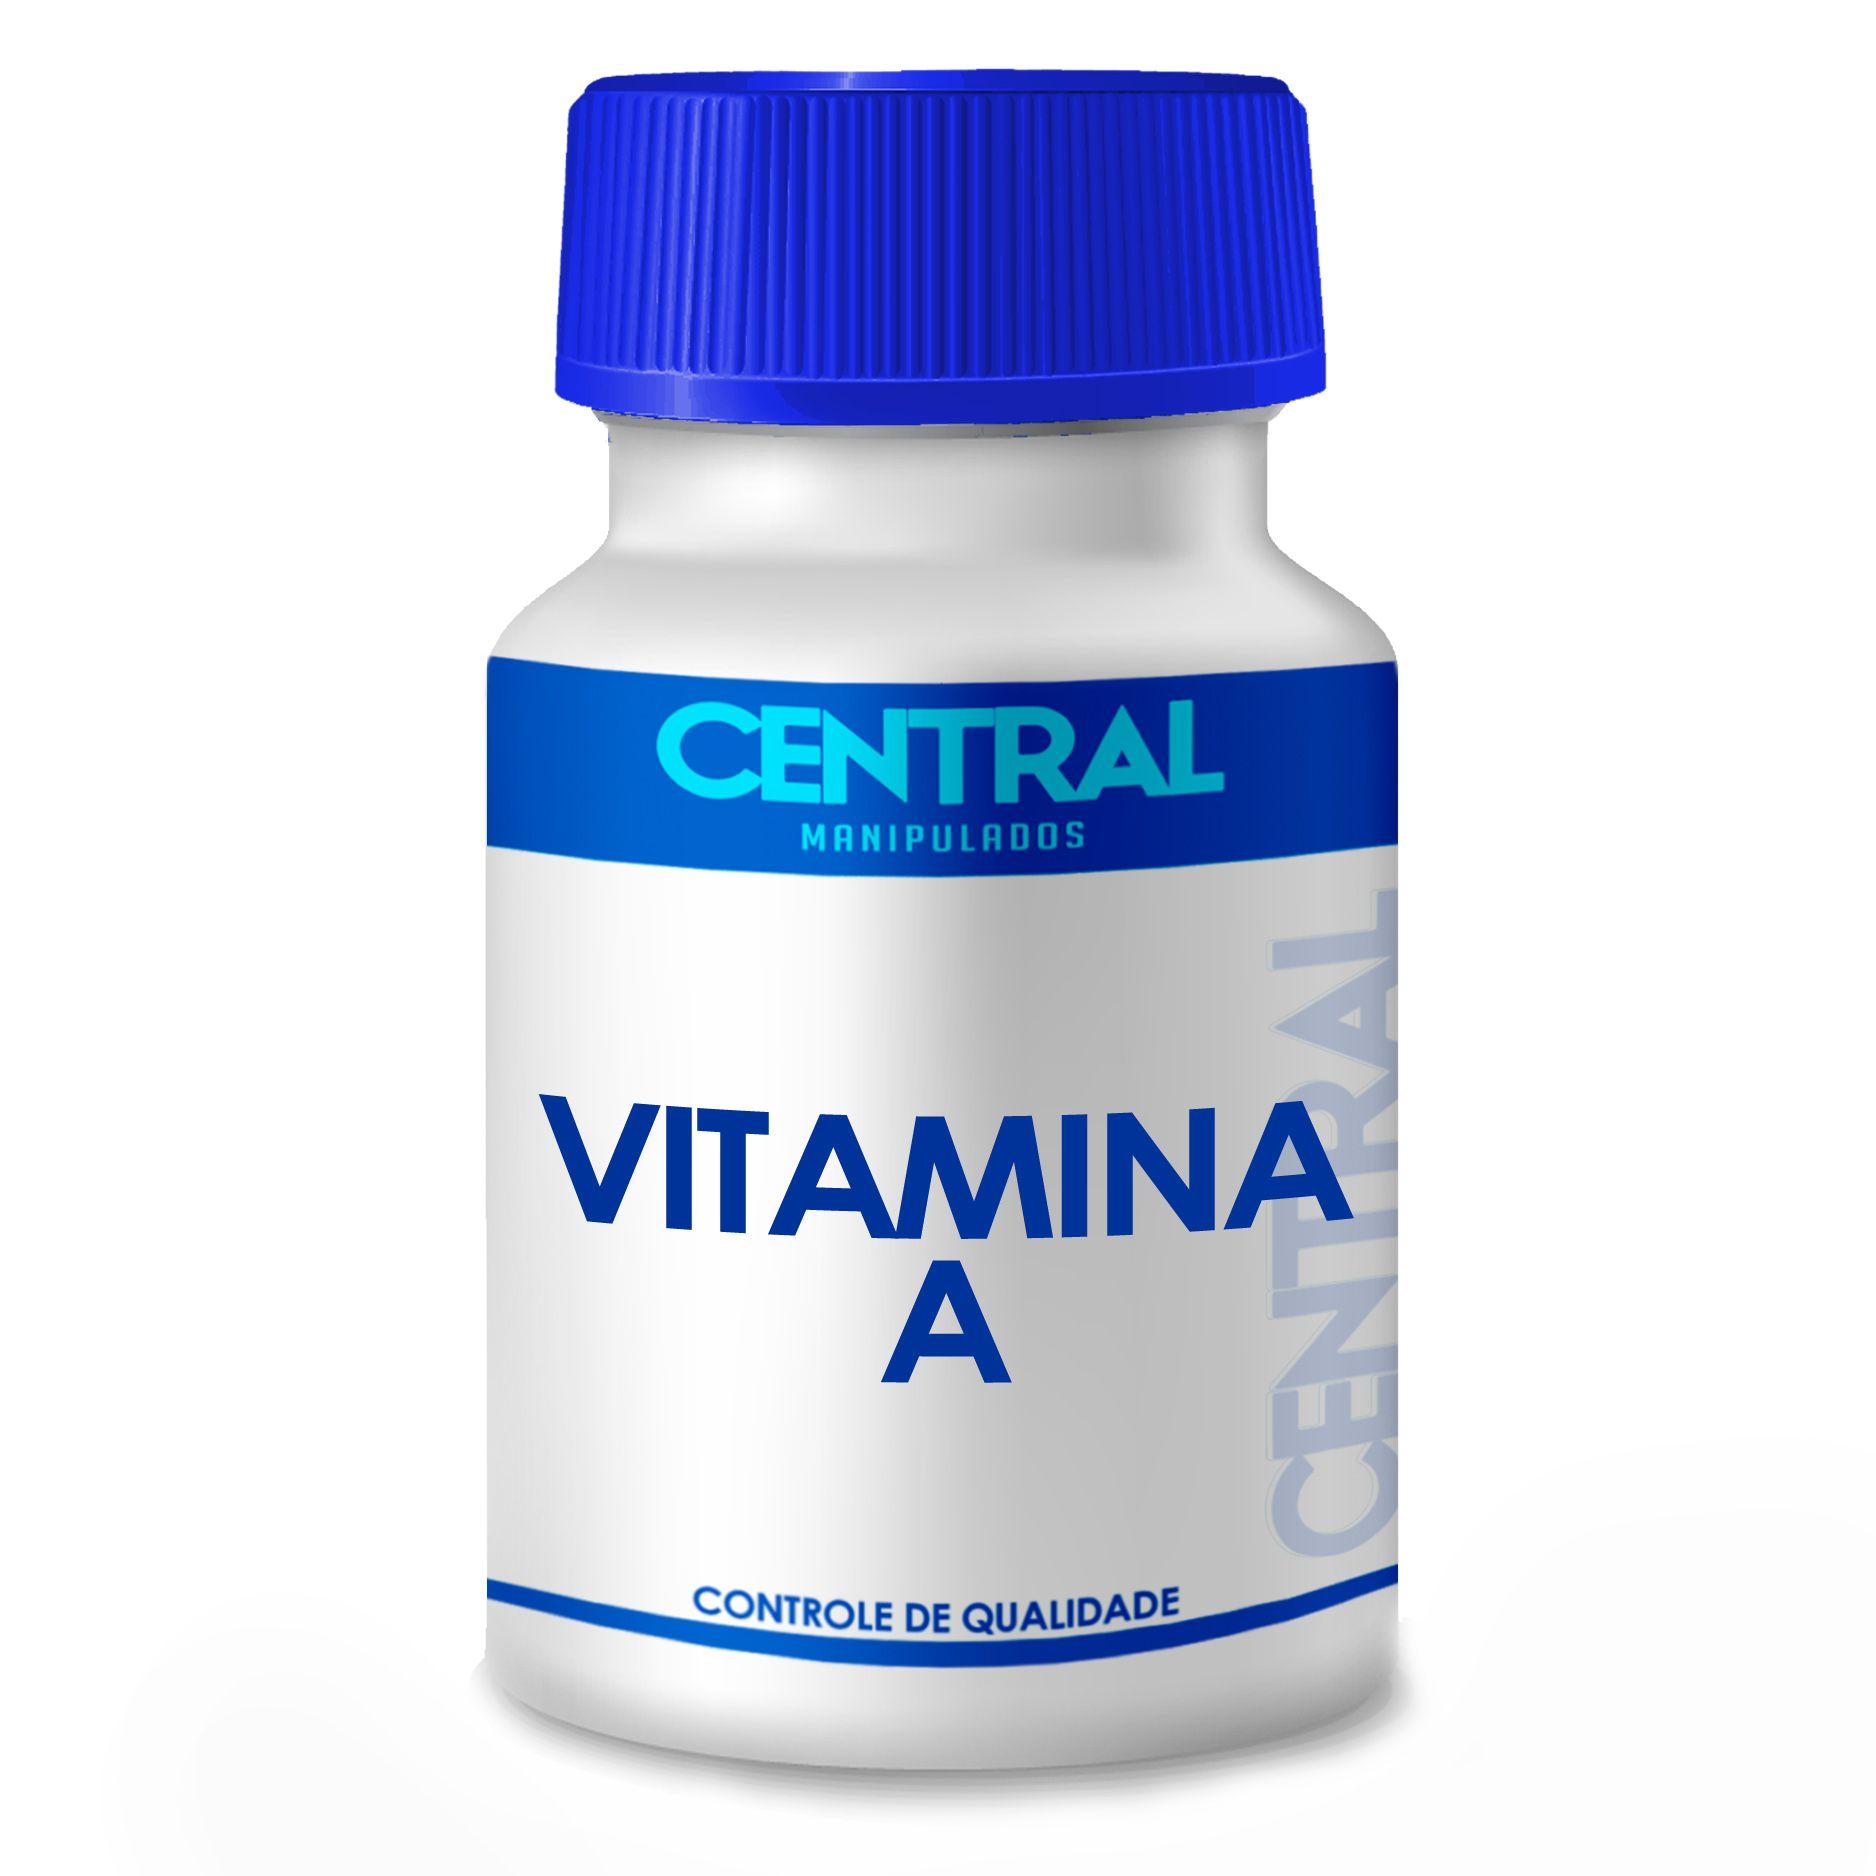 Vitamina A - Boa para Cálculo Renal, Imunidade, Olhos, Ossos, Dentes, Pele e Unhas - 10.000UI 30 cápsulas